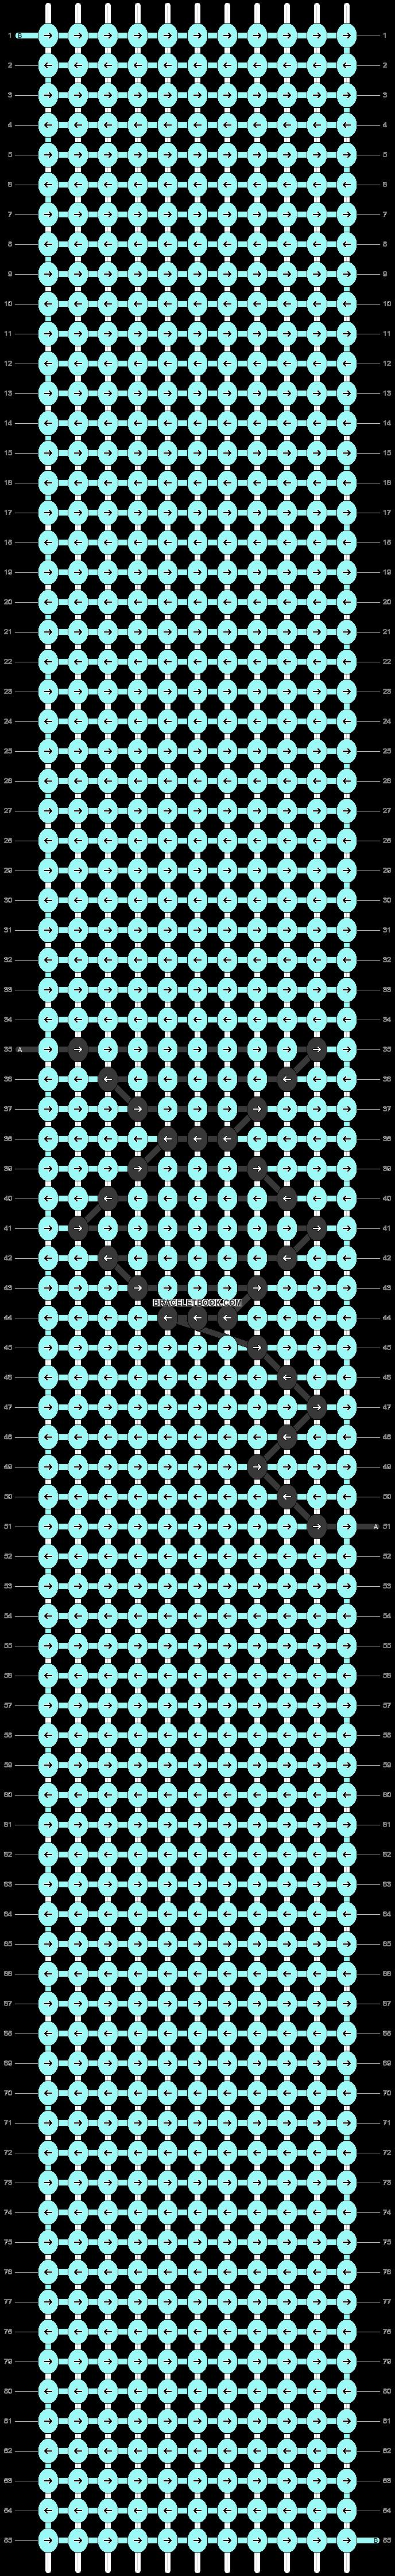 Alpha pattern #55581 pattern